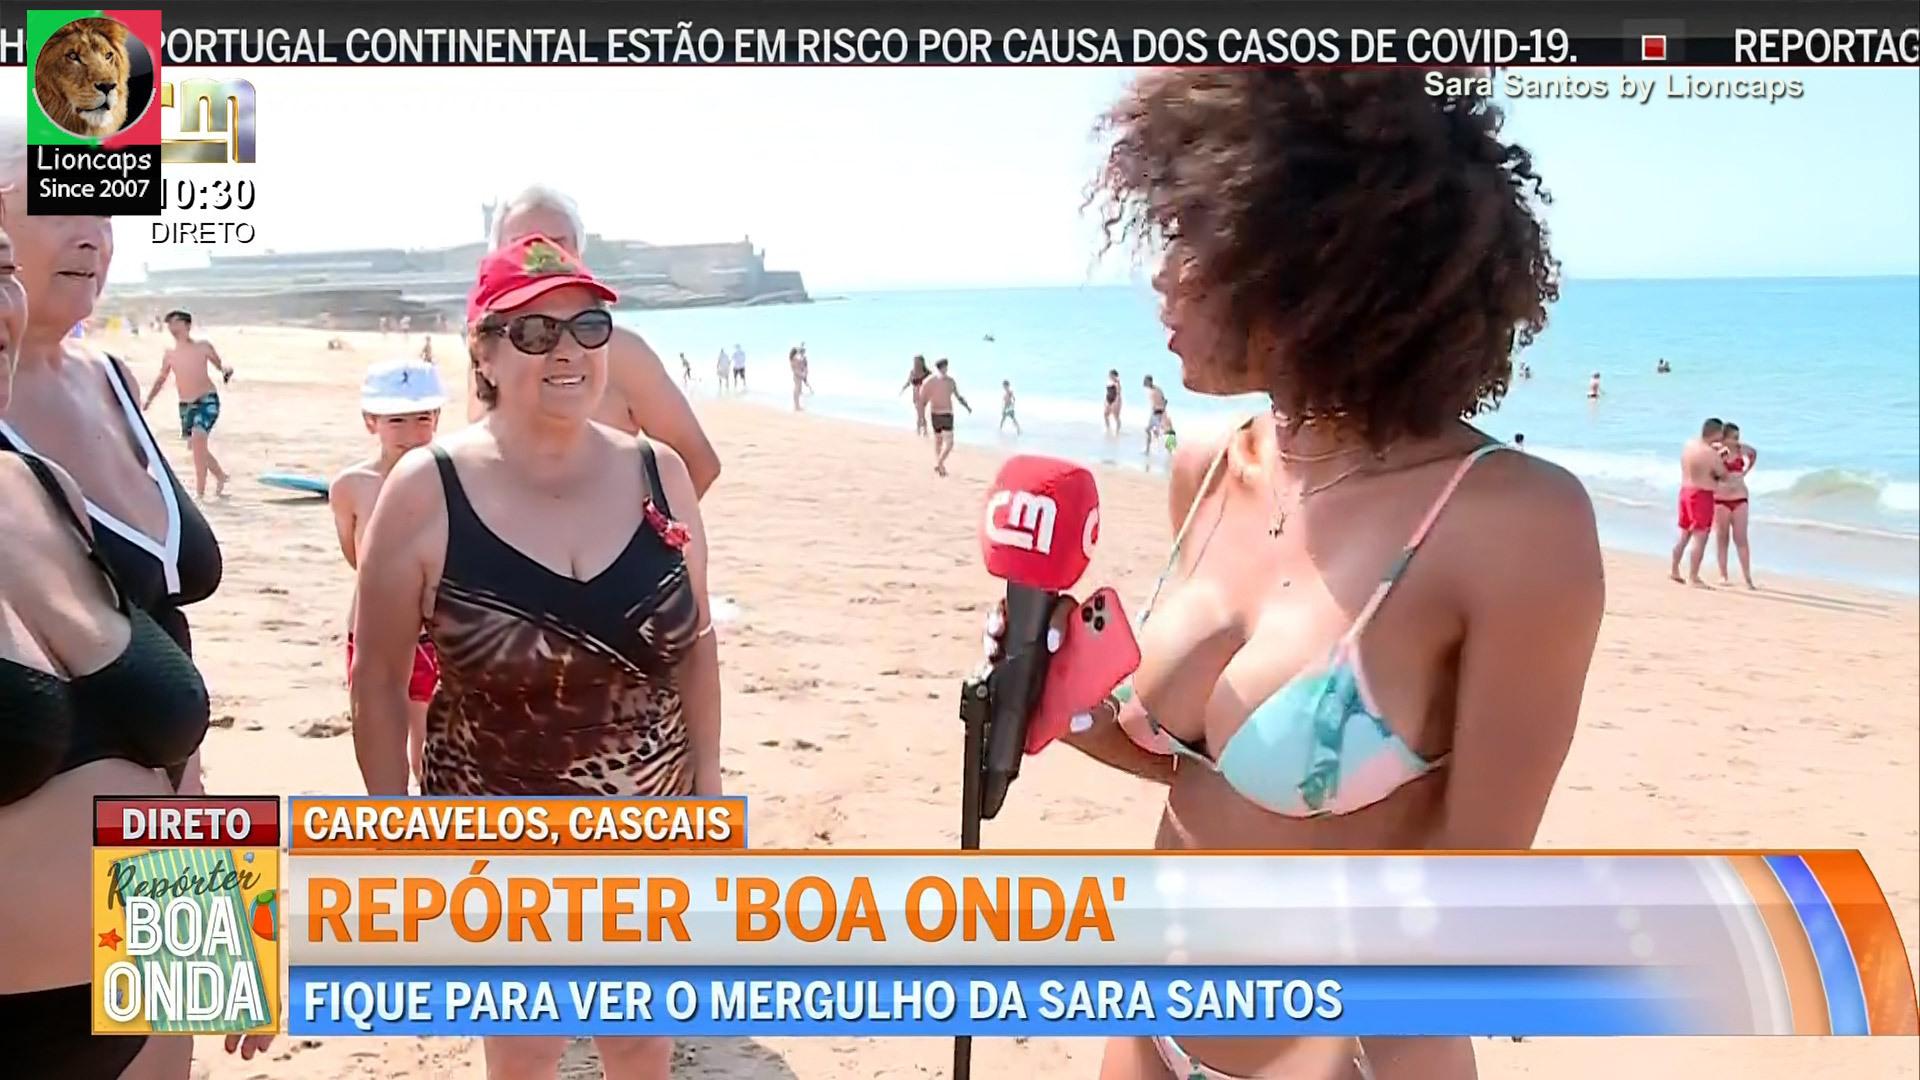 sara_santos_praia_lioncaps_24_07_2021_01 (13).jpg